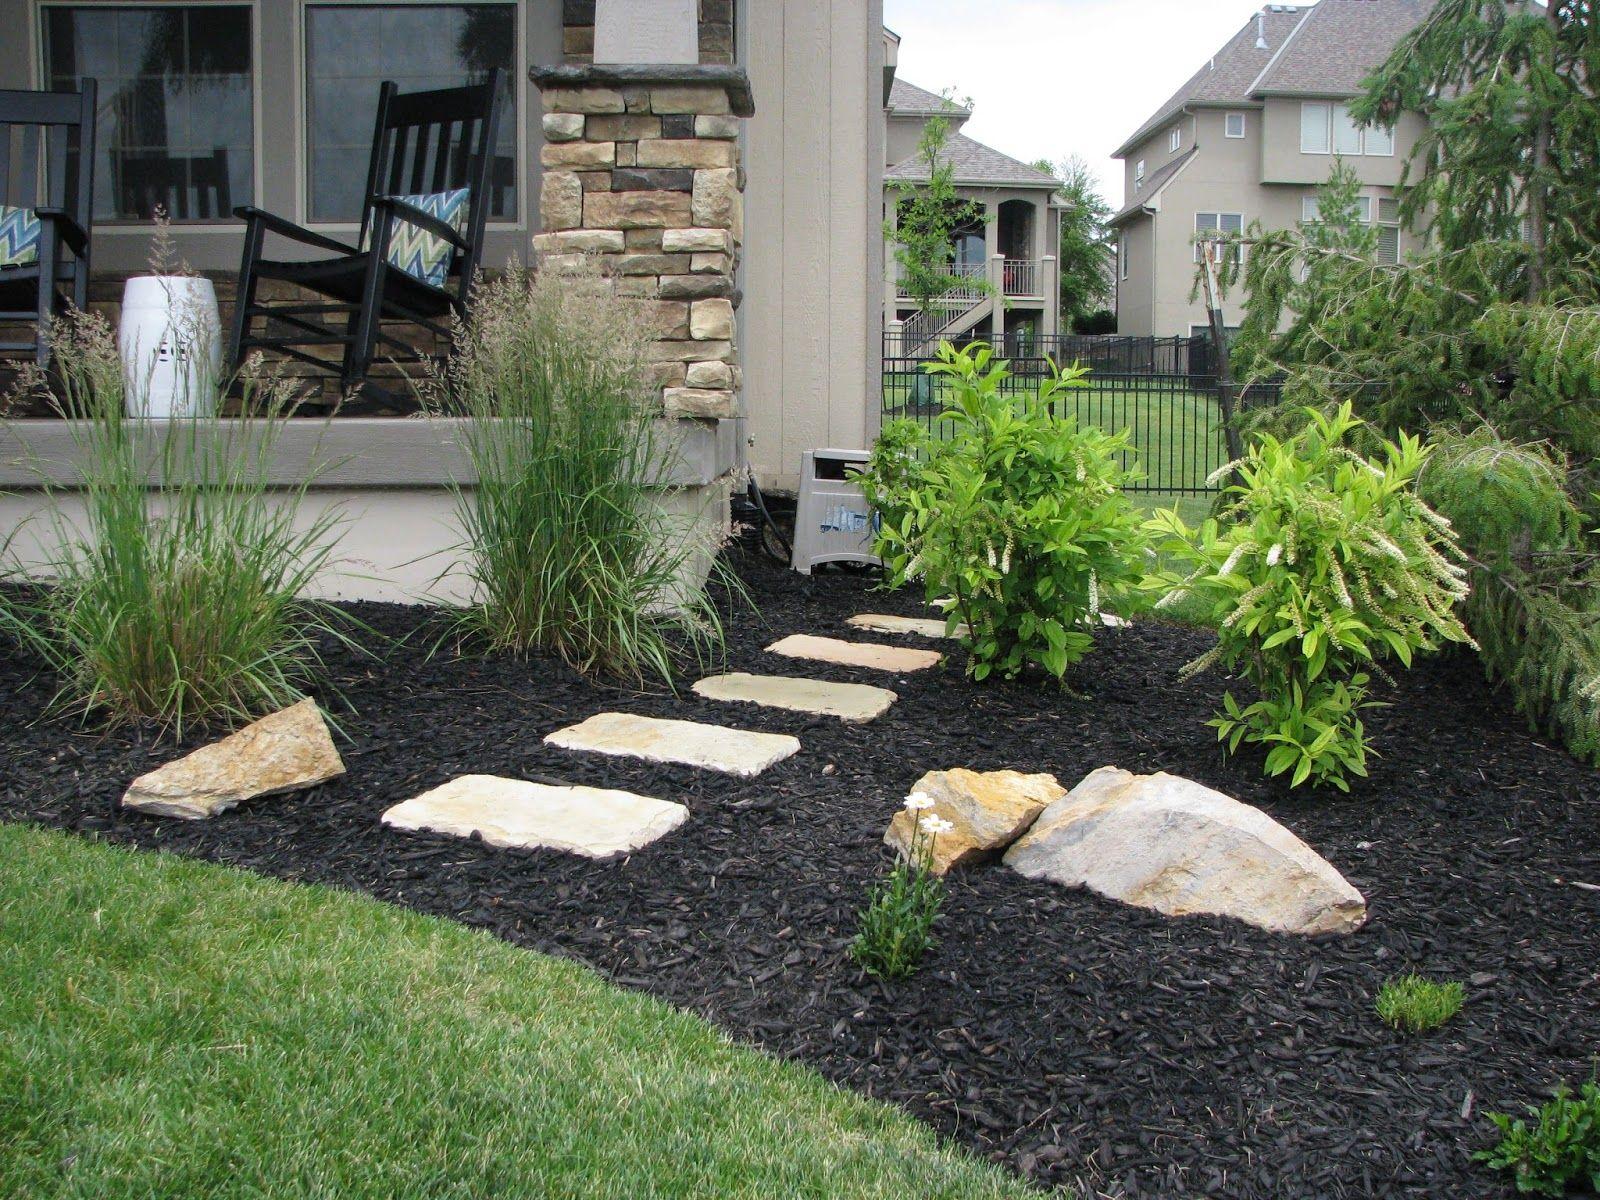 Backyard stepping stone ideas - Life Love Larson Laying Stepping Stones